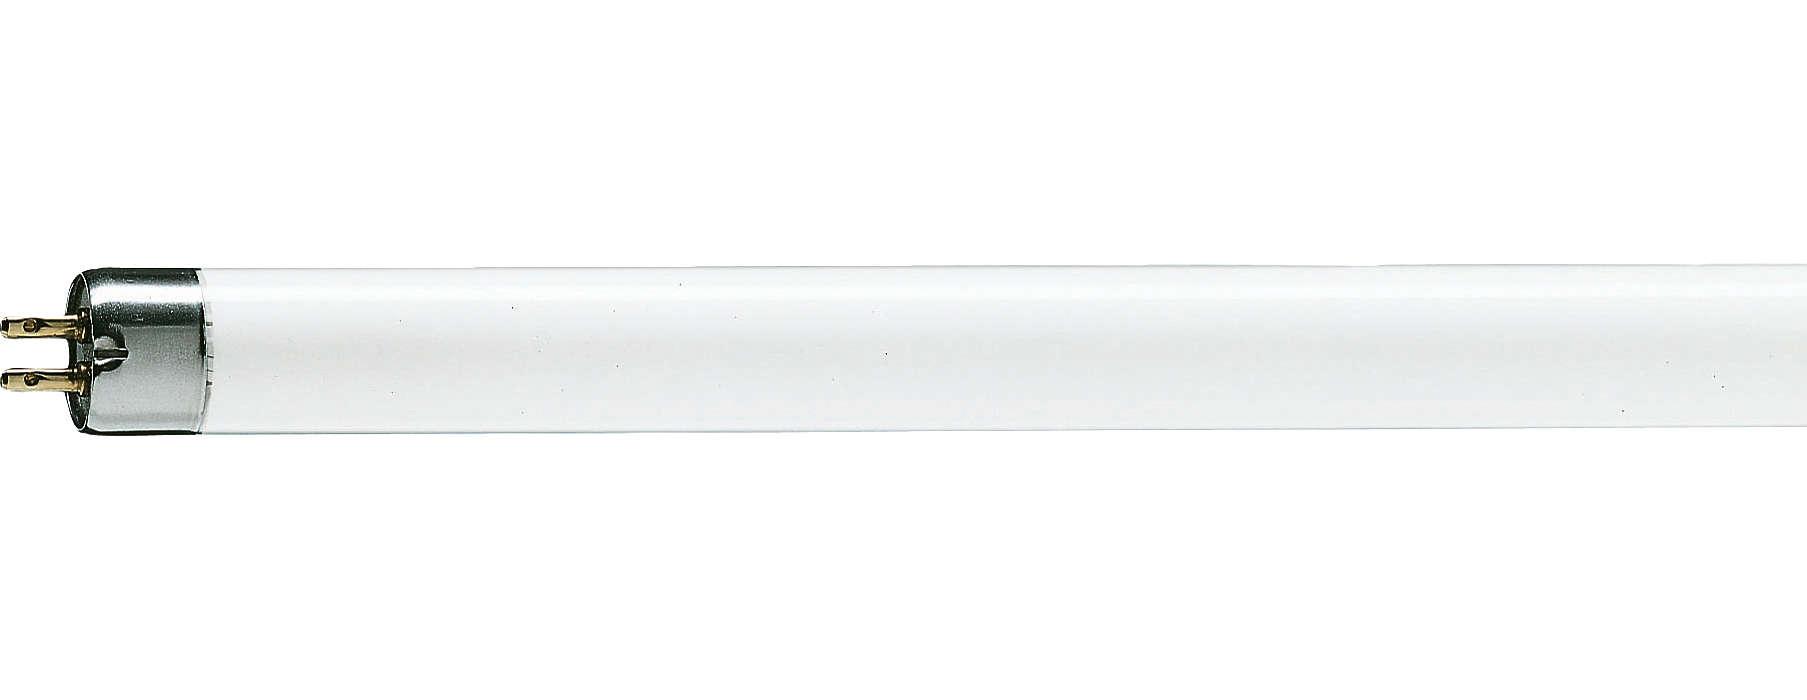 Kompakt lysstofrør med forbedret lyskvalitet